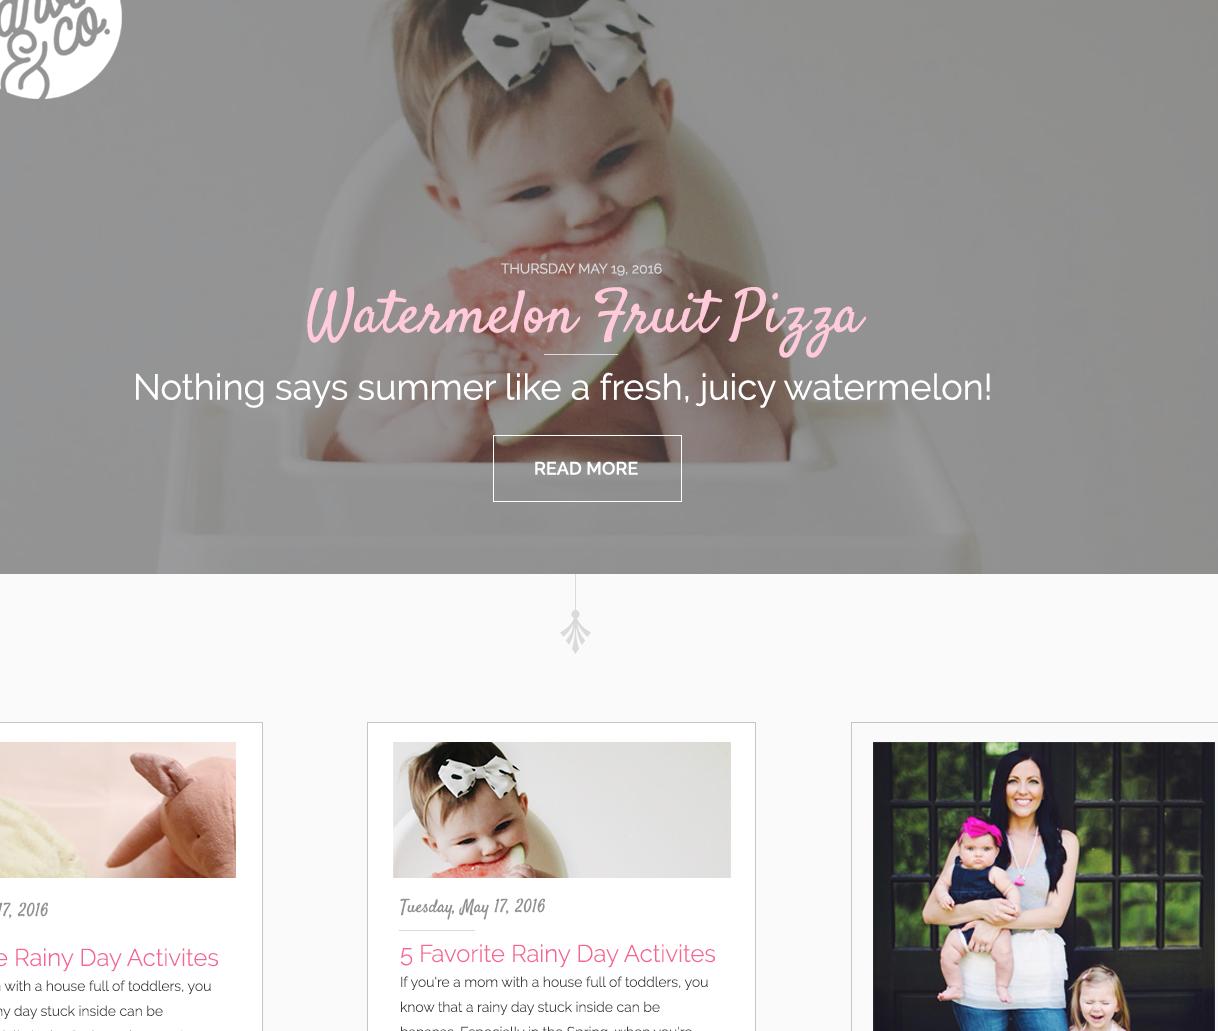 Holly Reynolds - UI and Web Design - GarvinAndCo.com